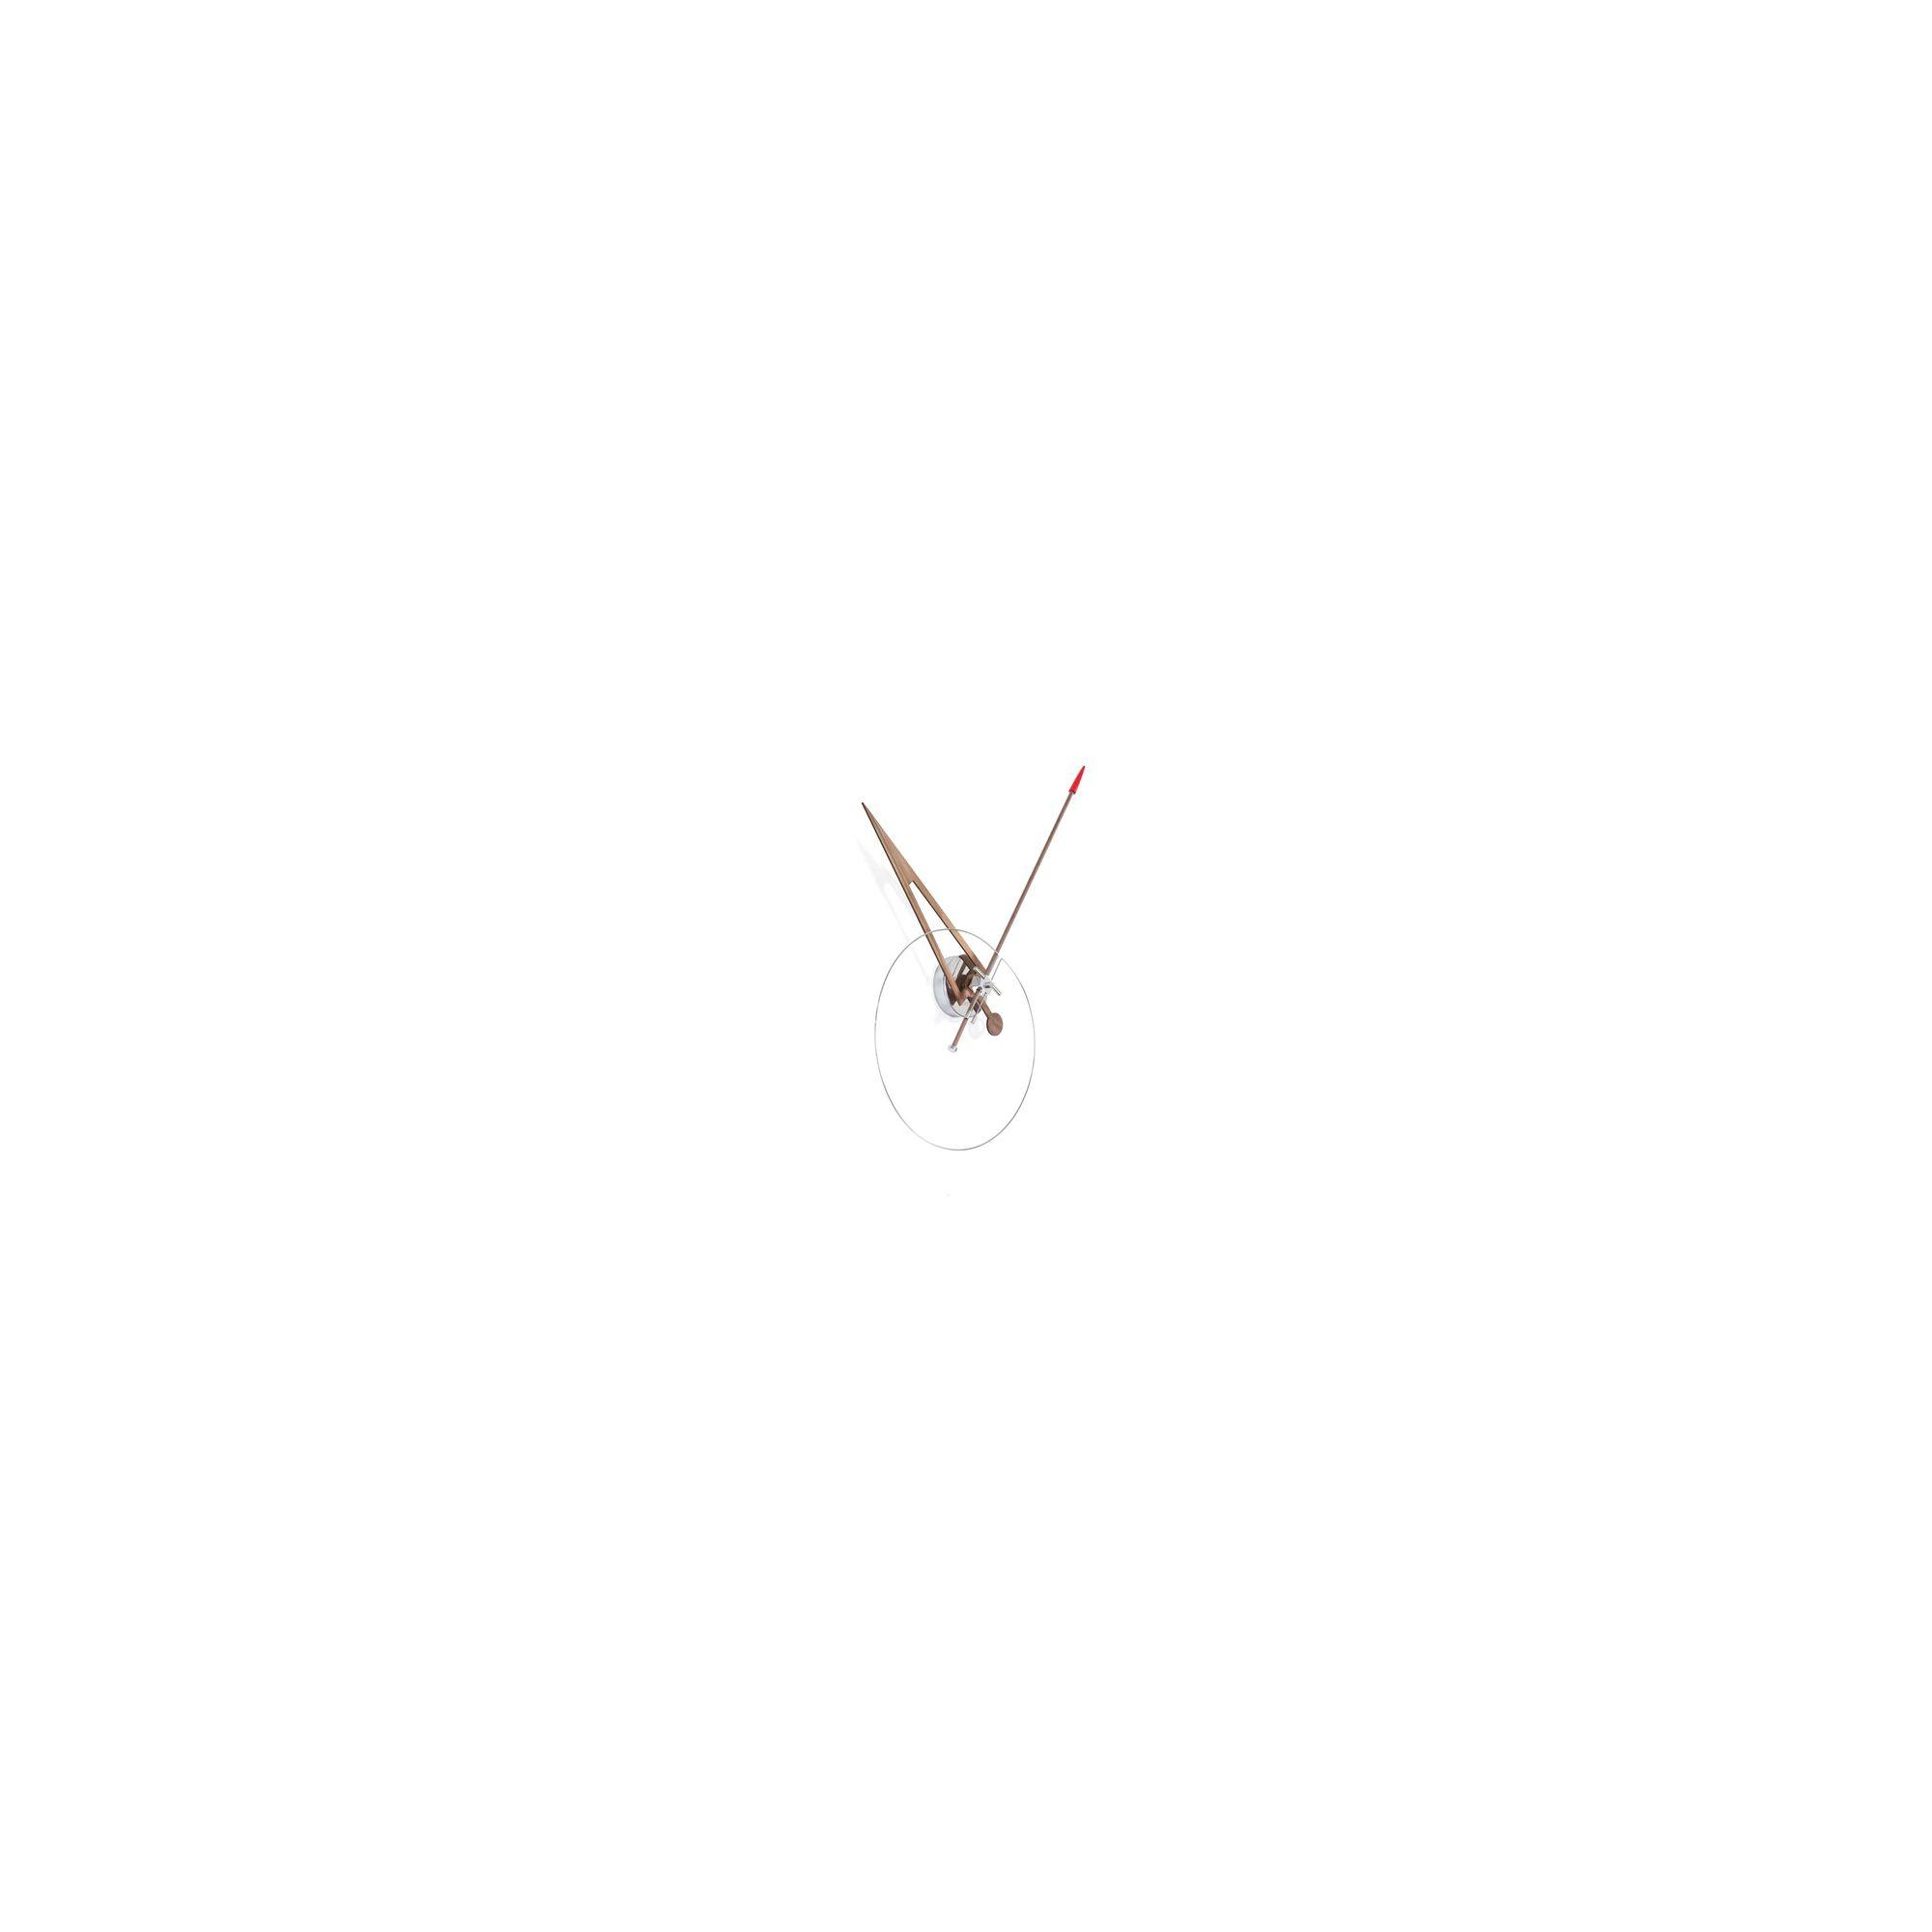 NOMON Cris Clock - Fiber Glass at Tesco Direct